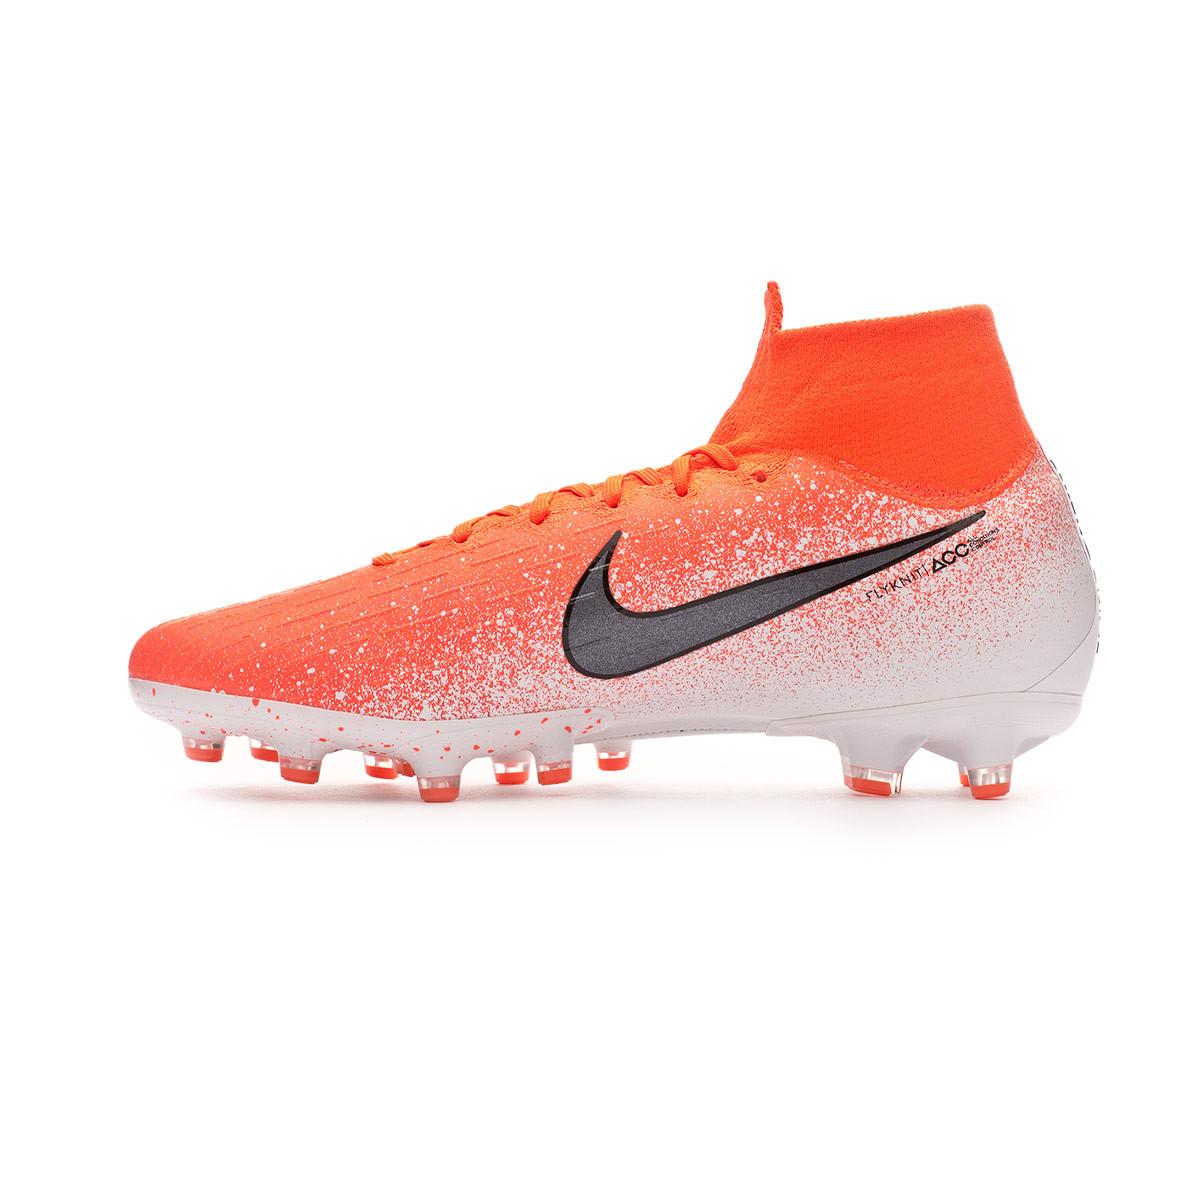 7b94f2a15 Football Boots Nike Mercurial Superfly VI Elite AG-Pro Hyper  crimson-Black-White - Football store Fútbol Emotion